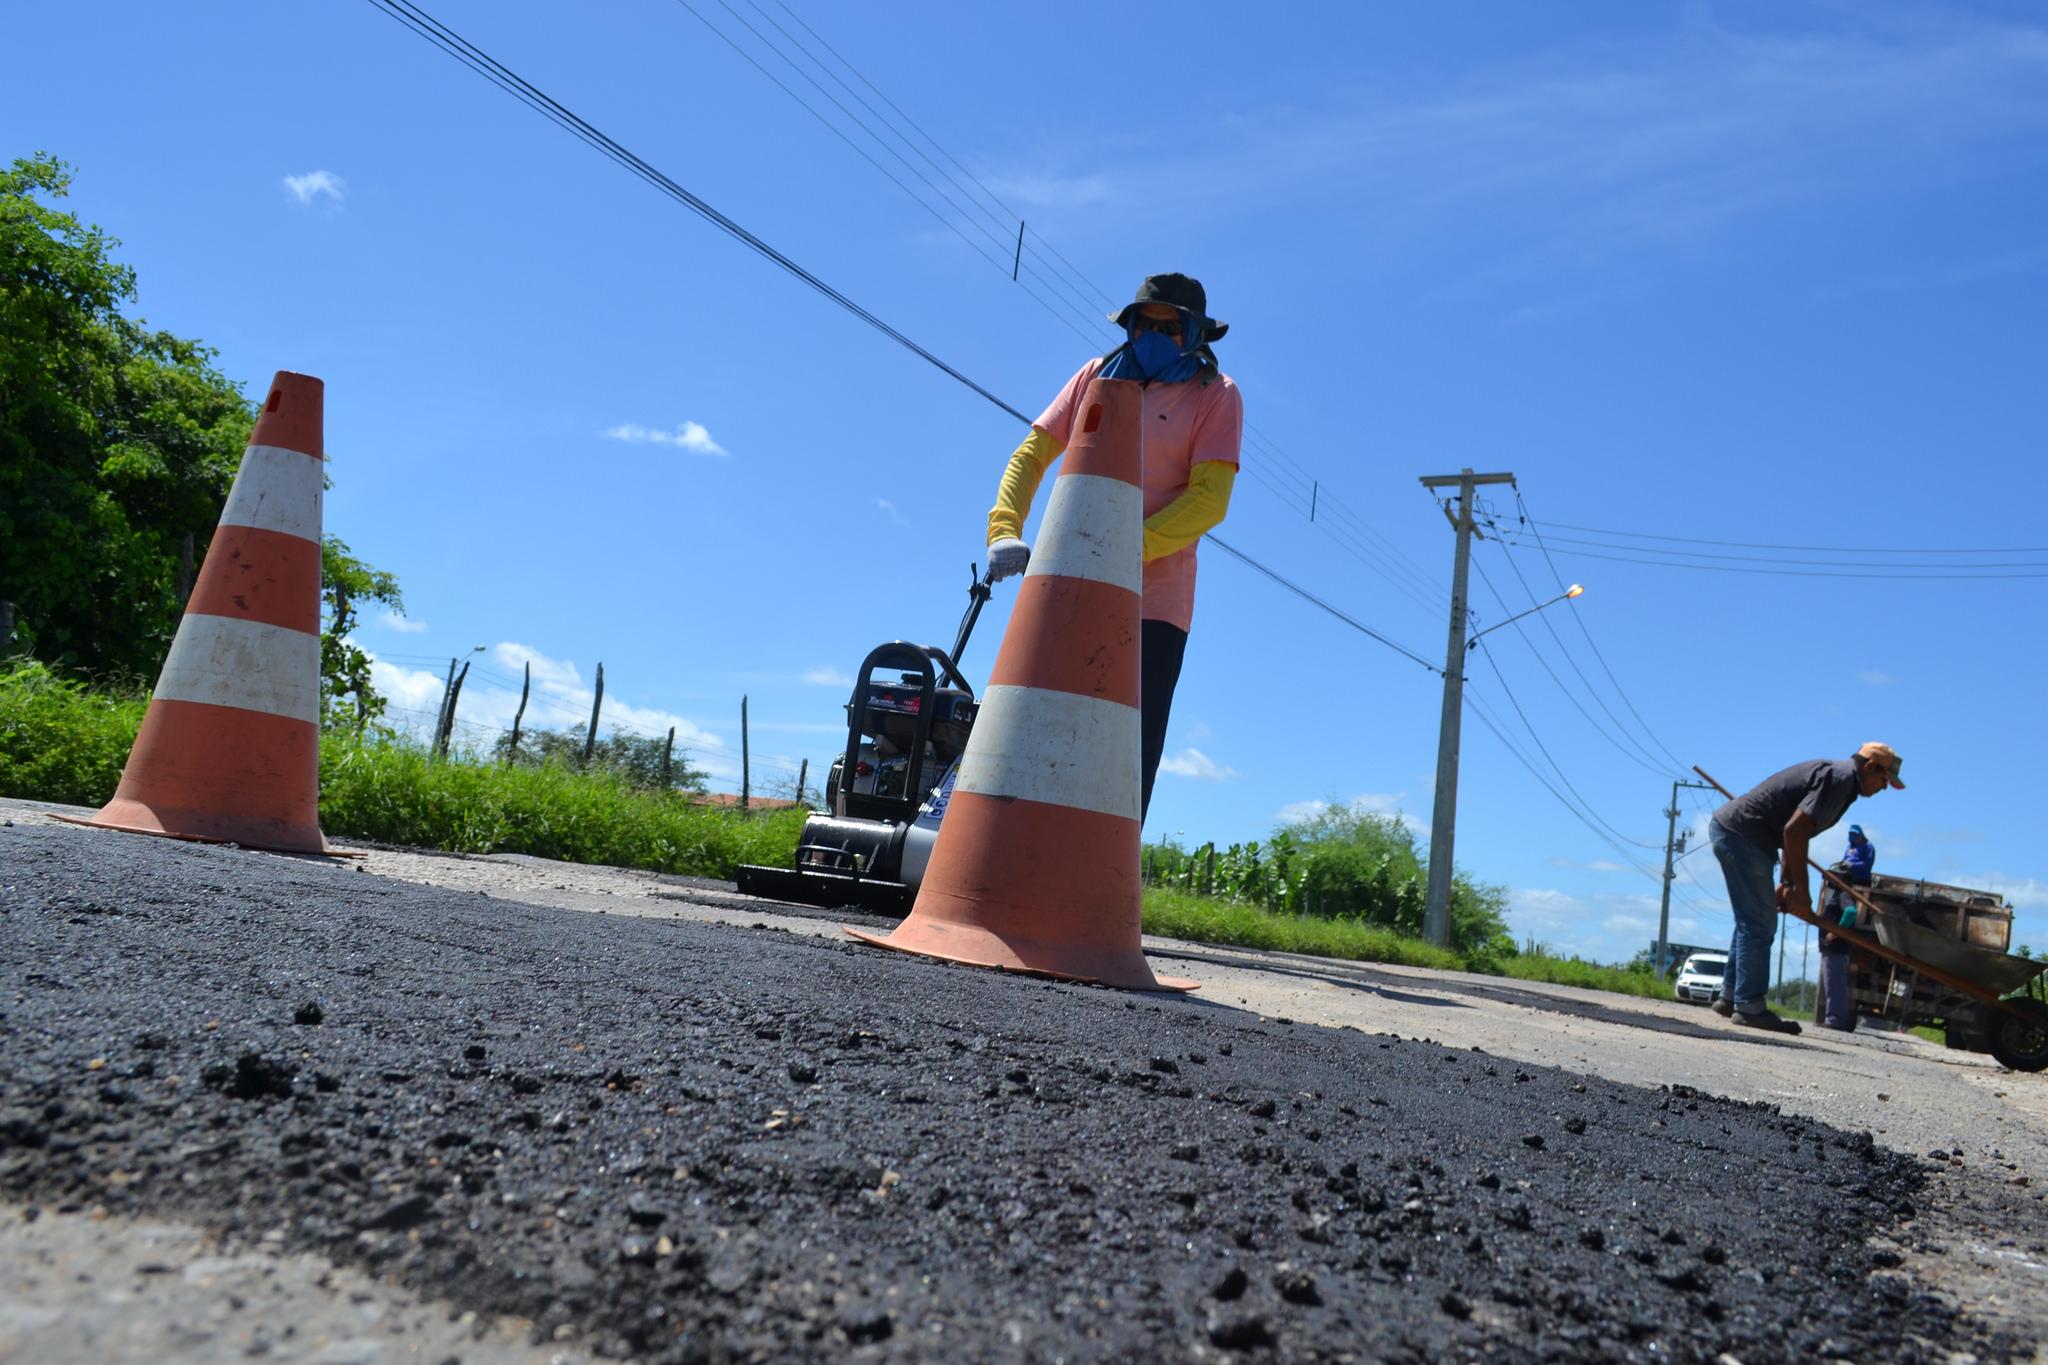 Prefeitura realiza reparos emergenciais na malha viária